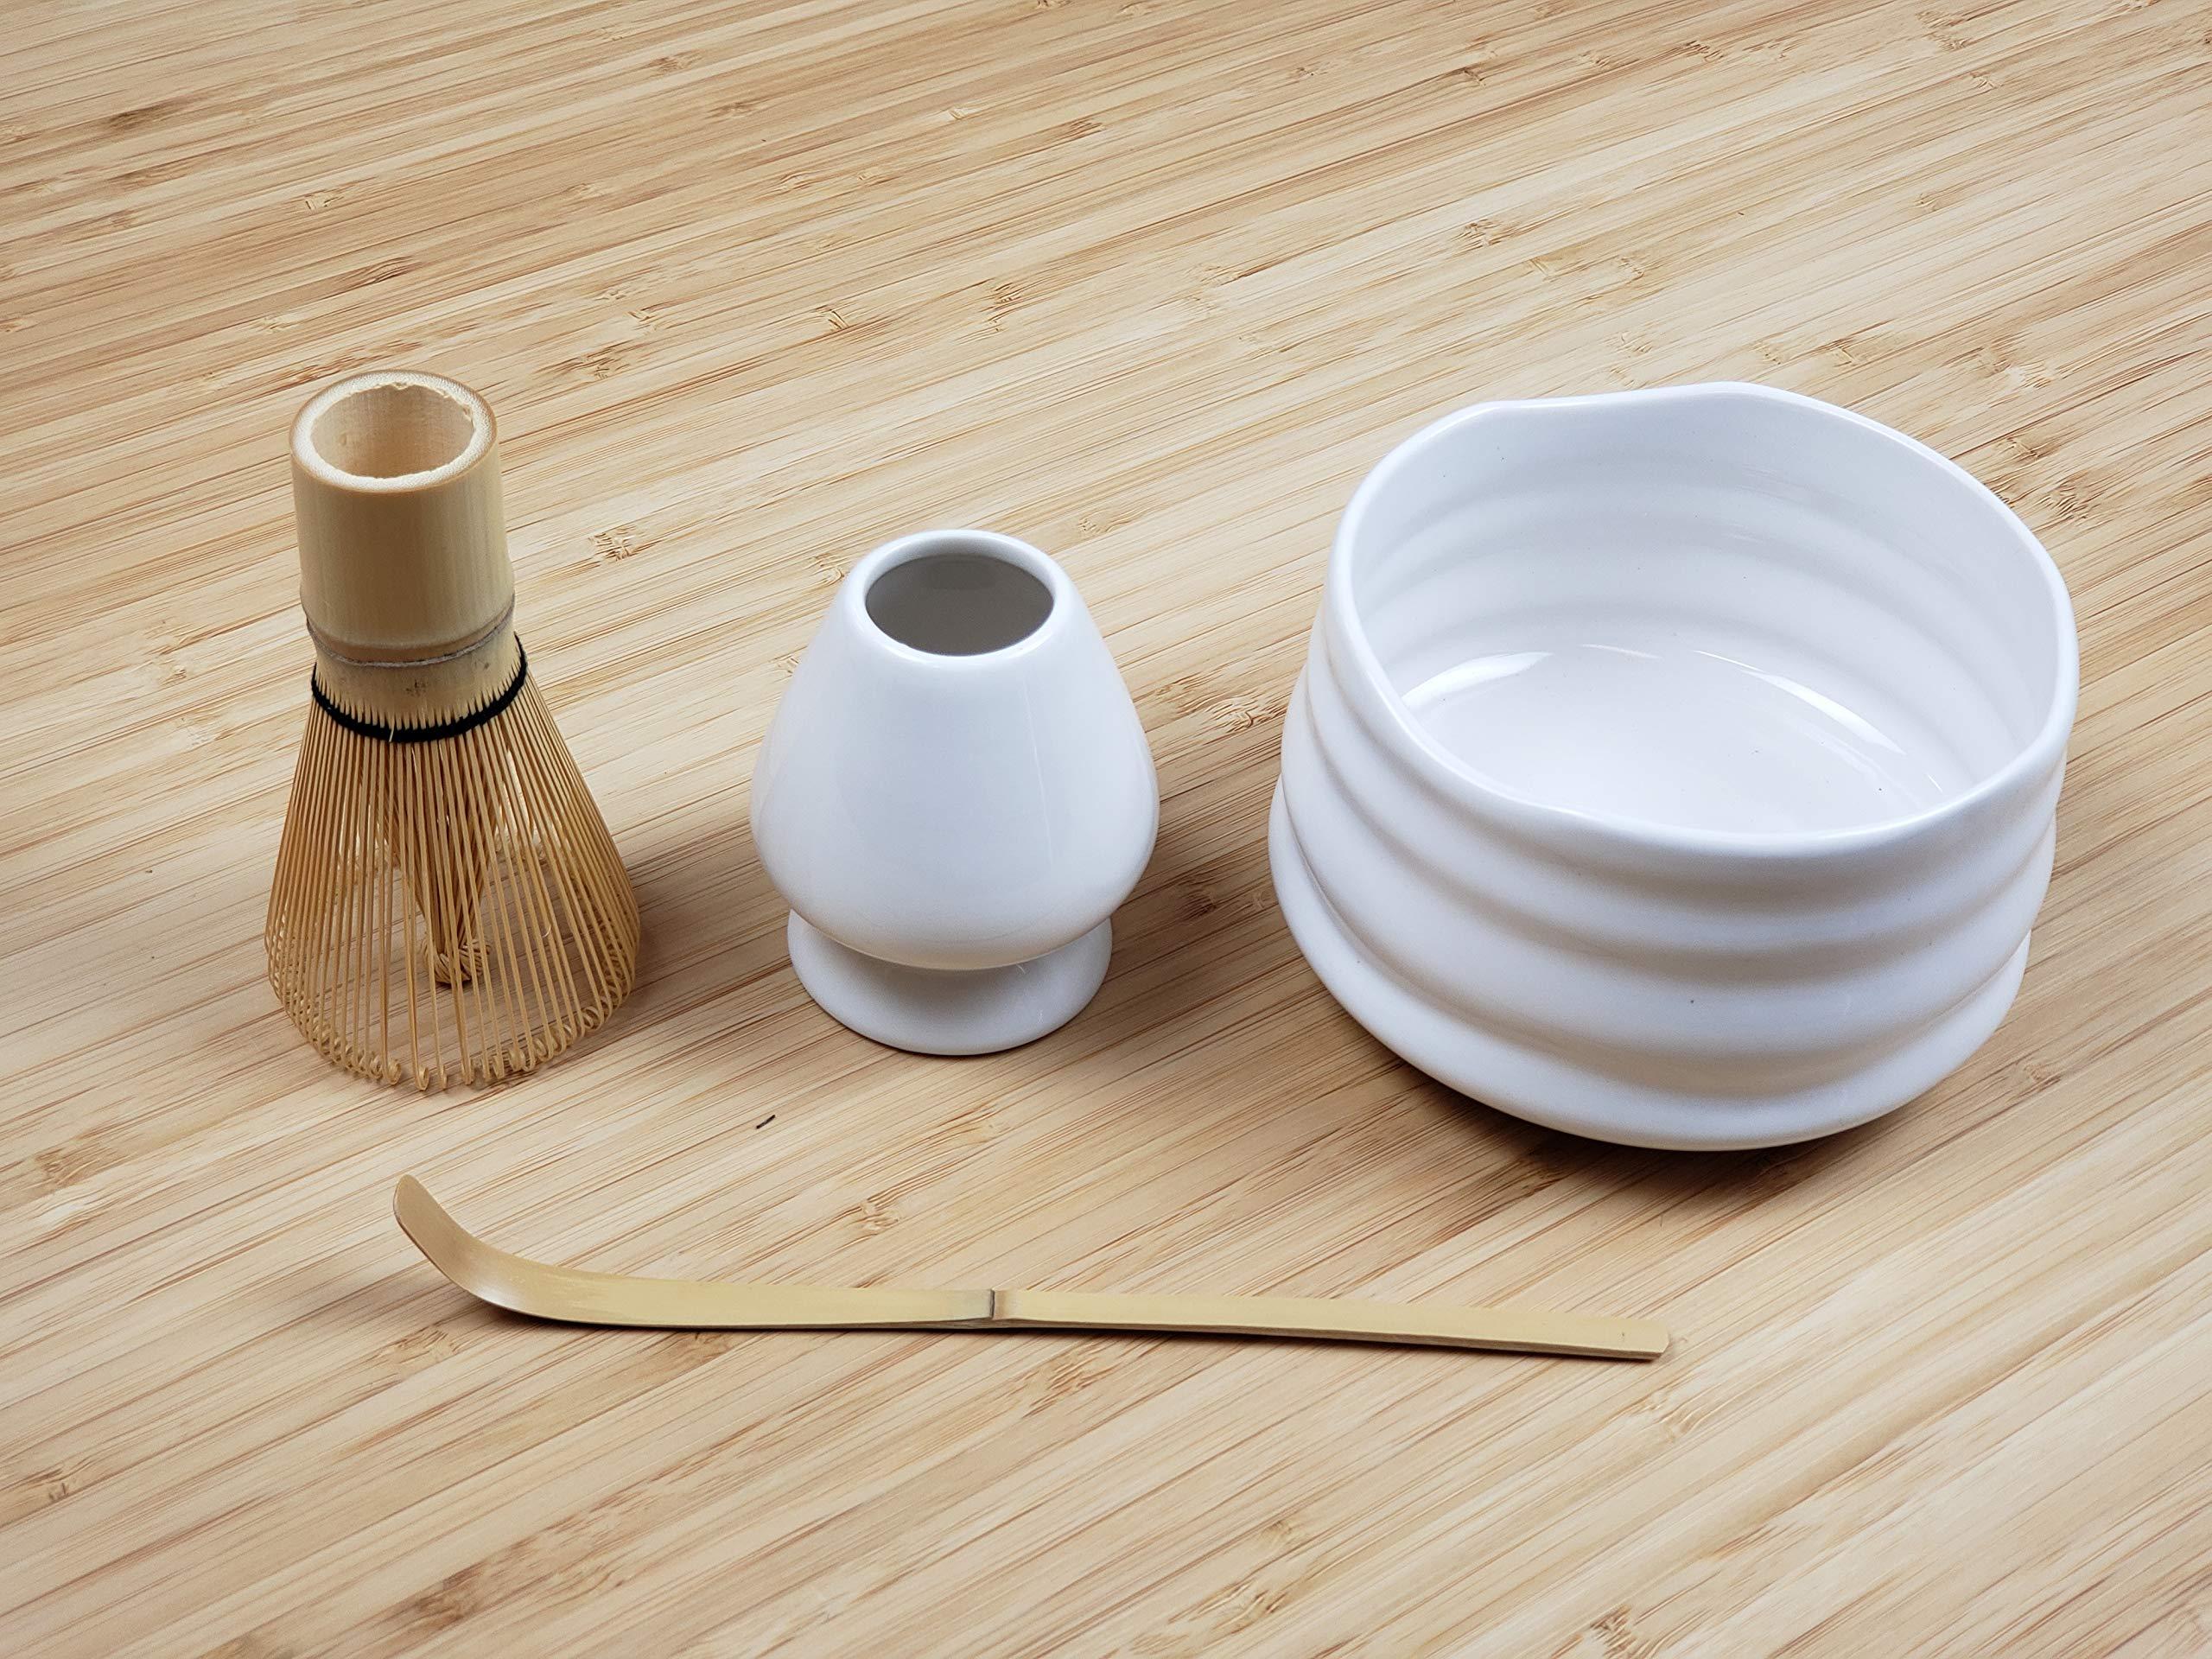 Matcha Starter Set White   5-Pieces Matcha Gift Set - Includes Japanese Ceremonial Matcha 1oz, Tea Bowl, 120-Prong Whisk, Chashaku Scoop, Whisk Stand   Elegant Design